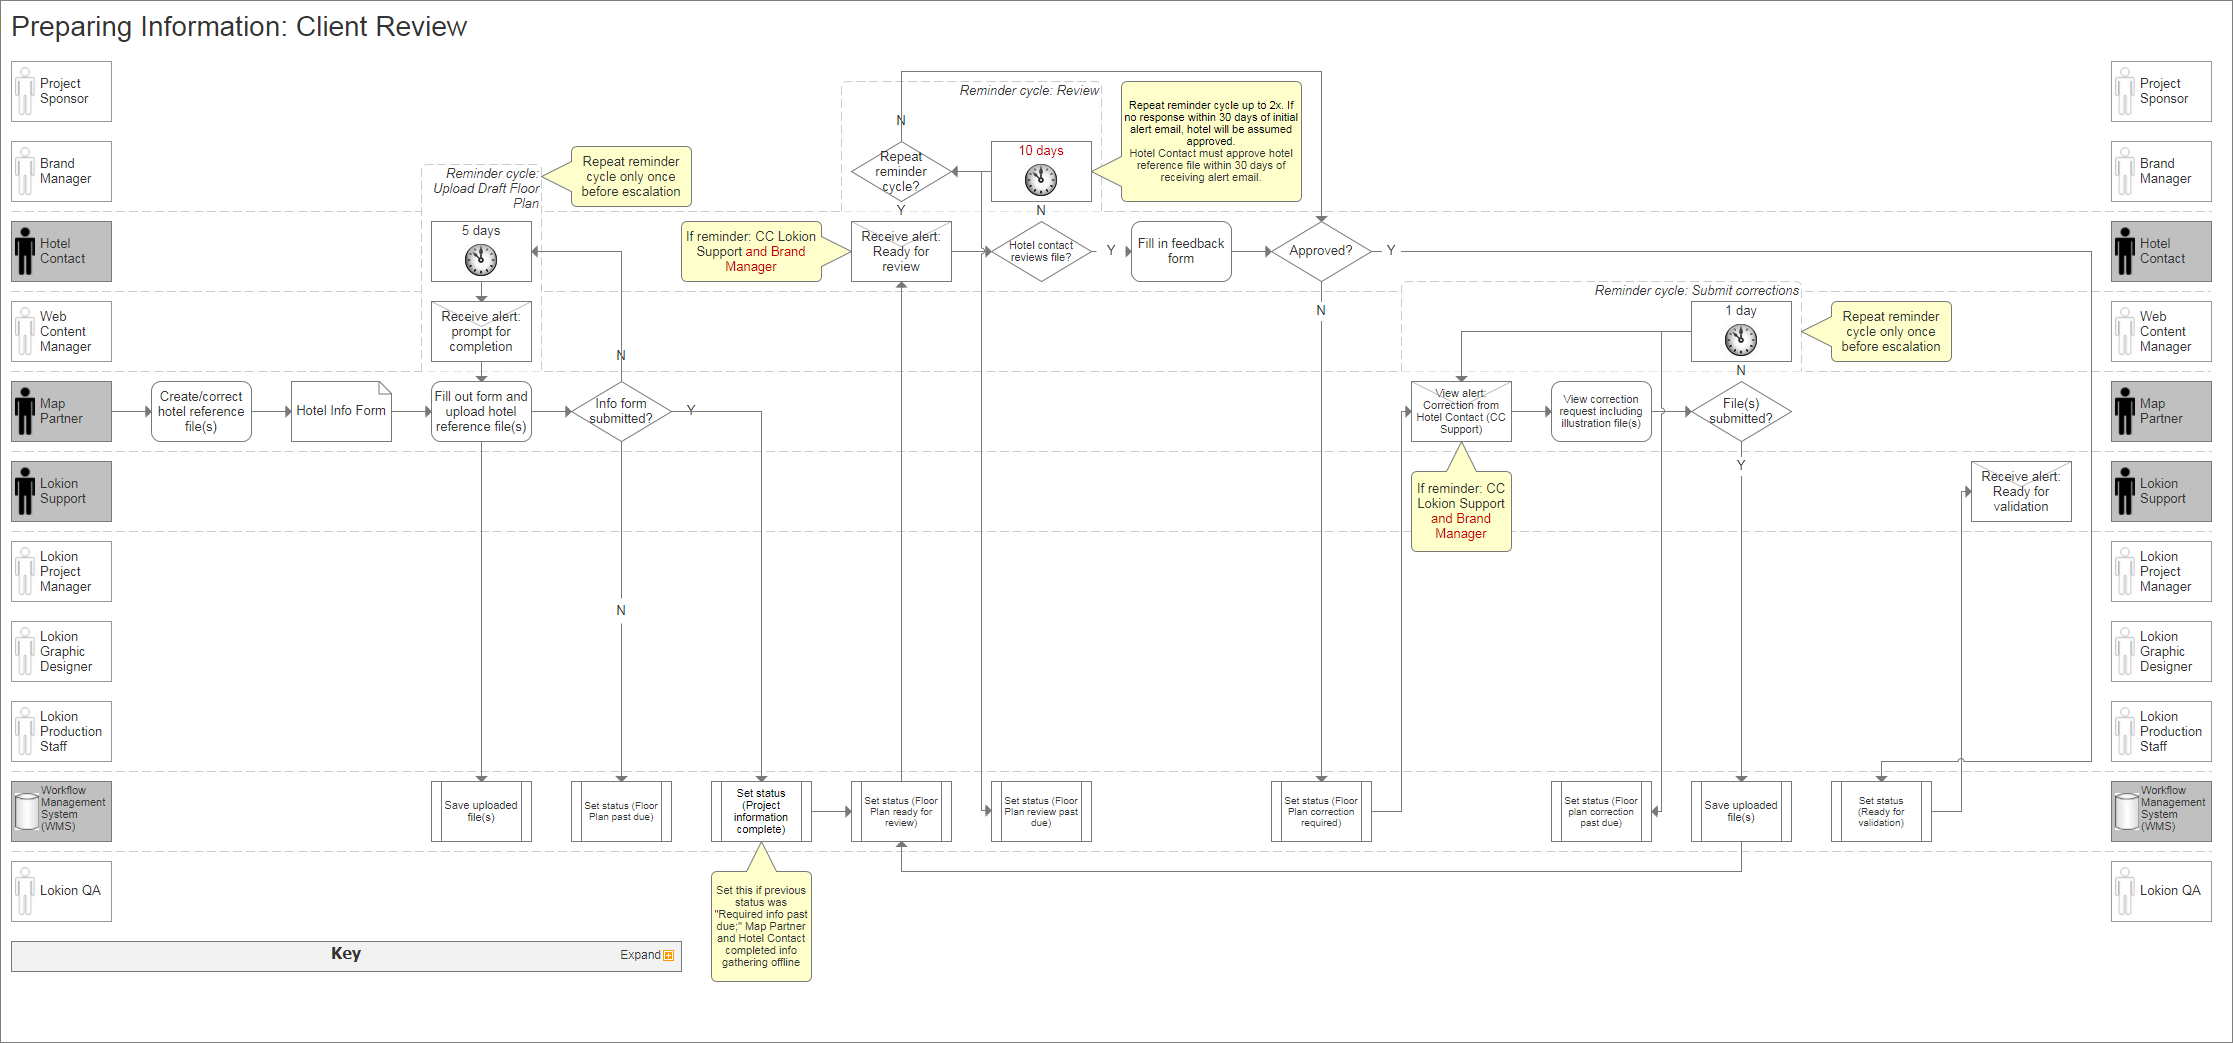 Workflow Management System David Mabury Ux Designer And Process Flow Diagram